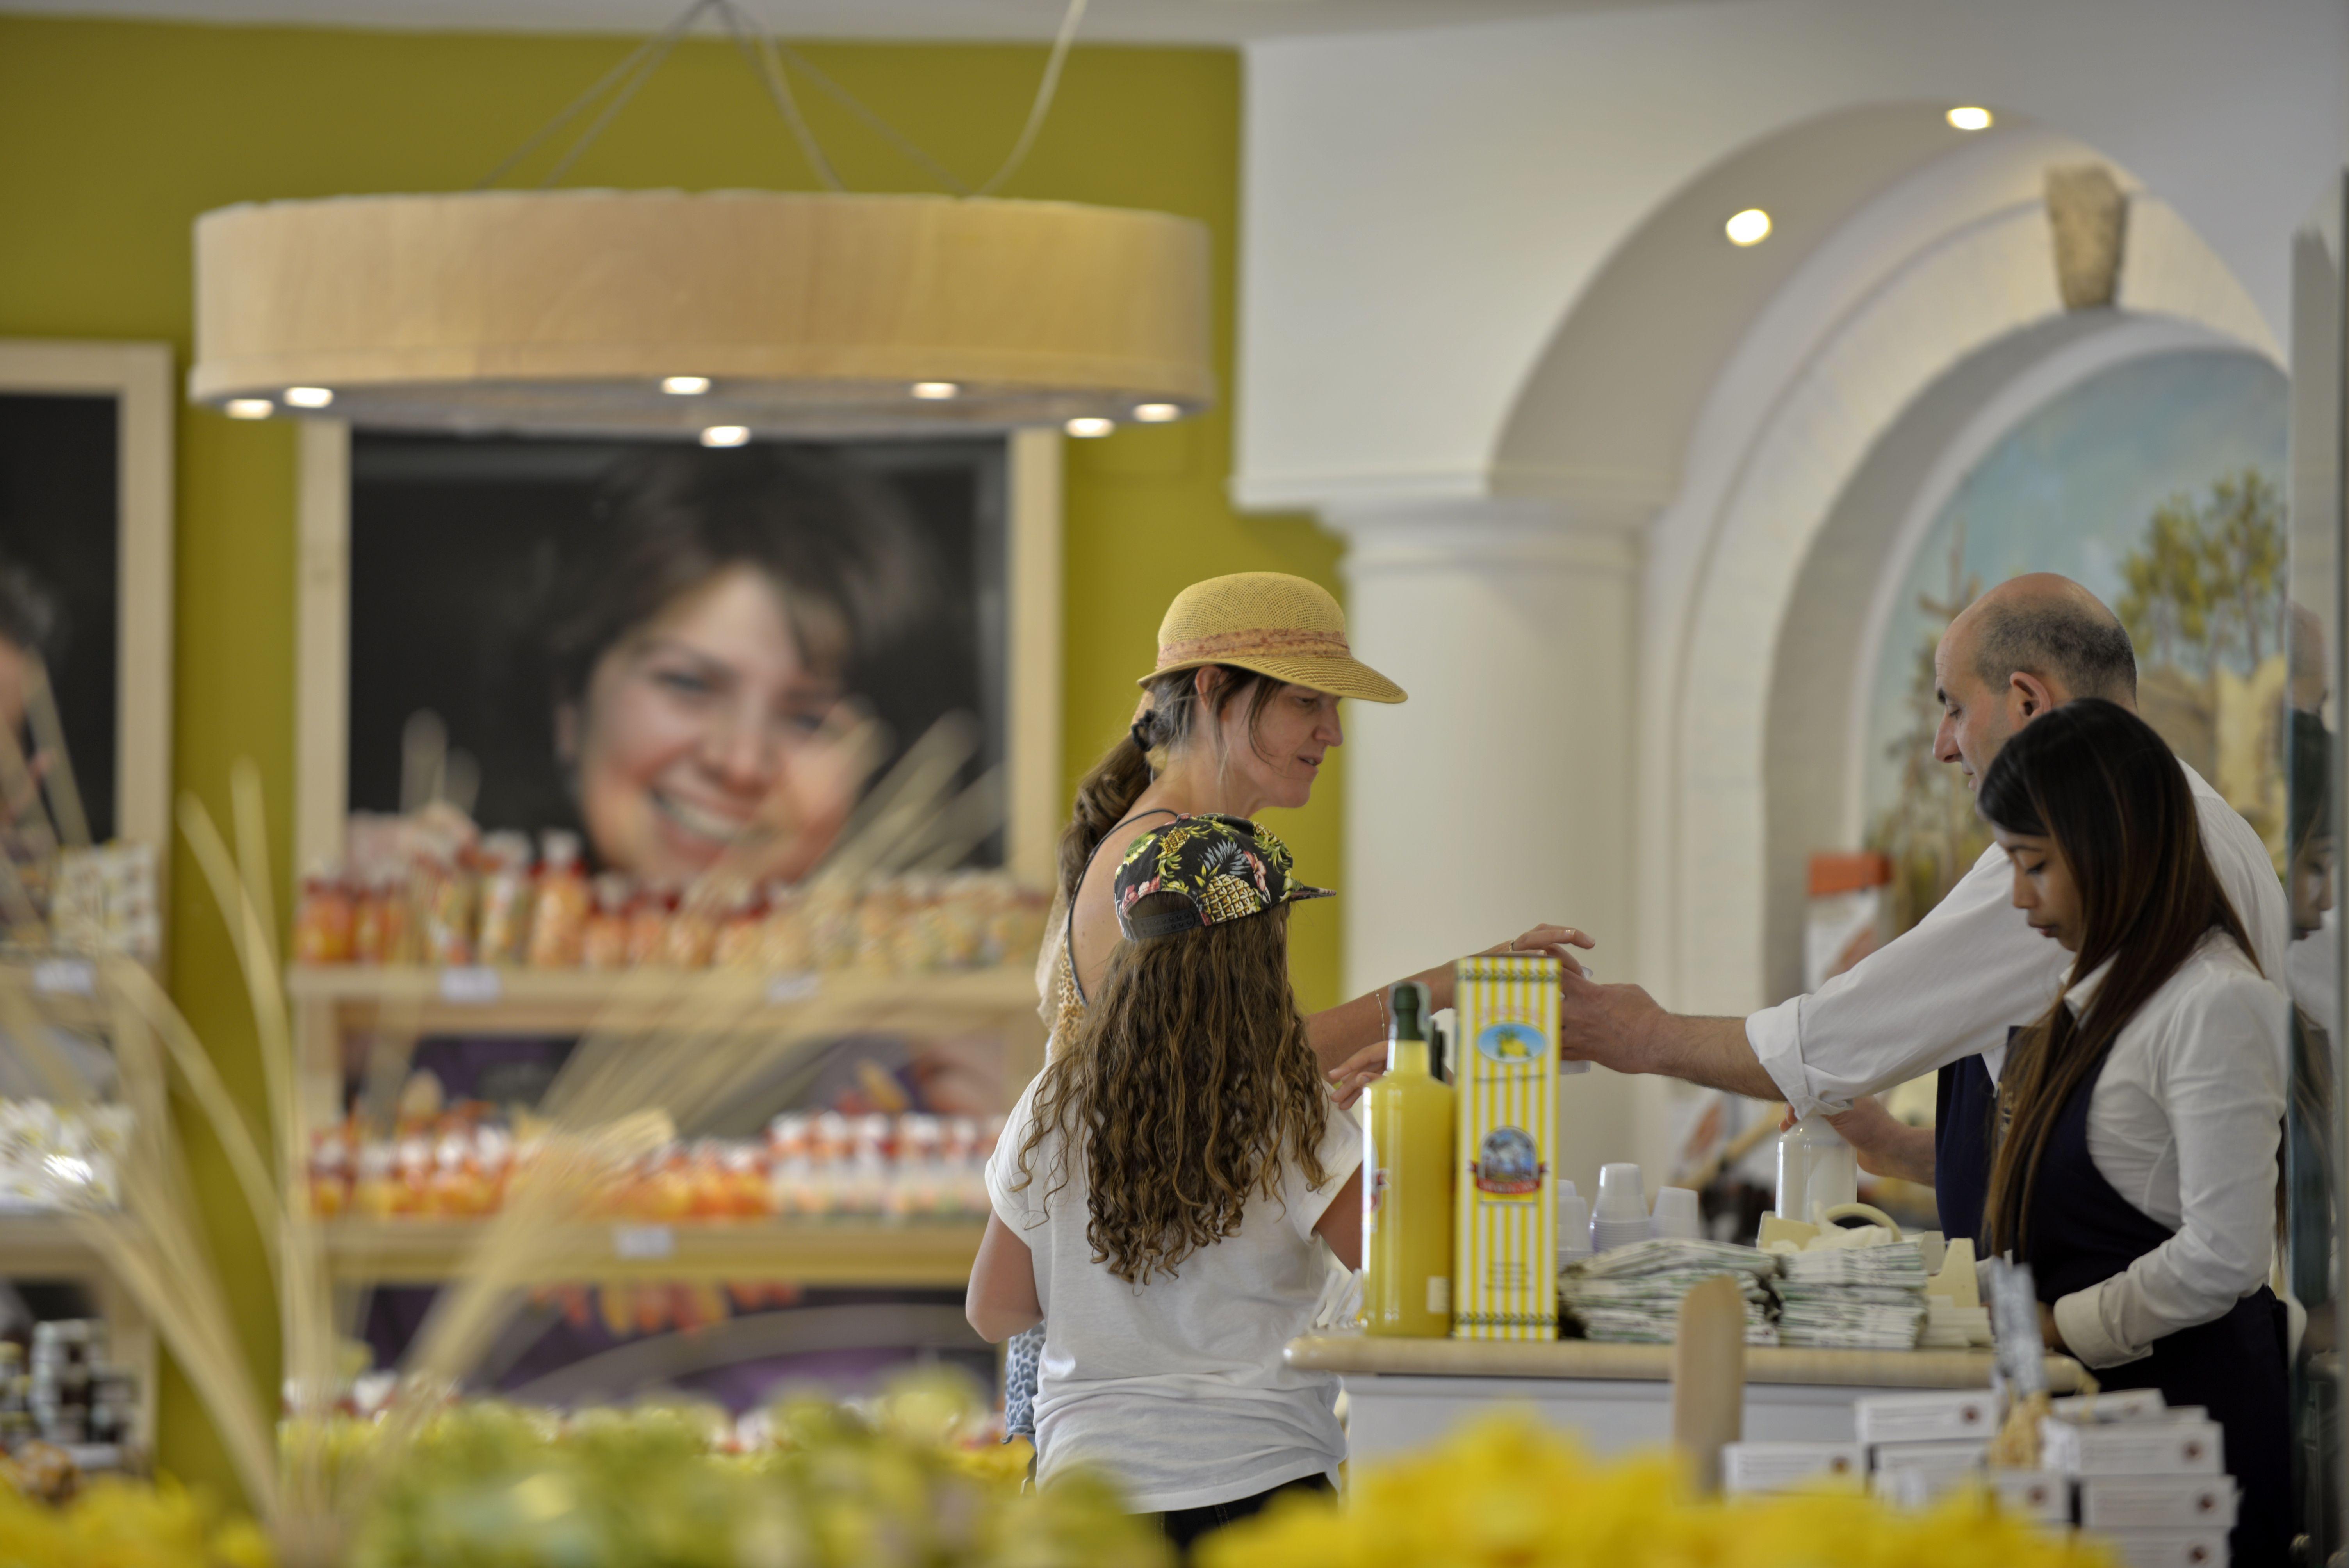 Our store in Anacapri (Capri island) - viale Axel Munthe, 16